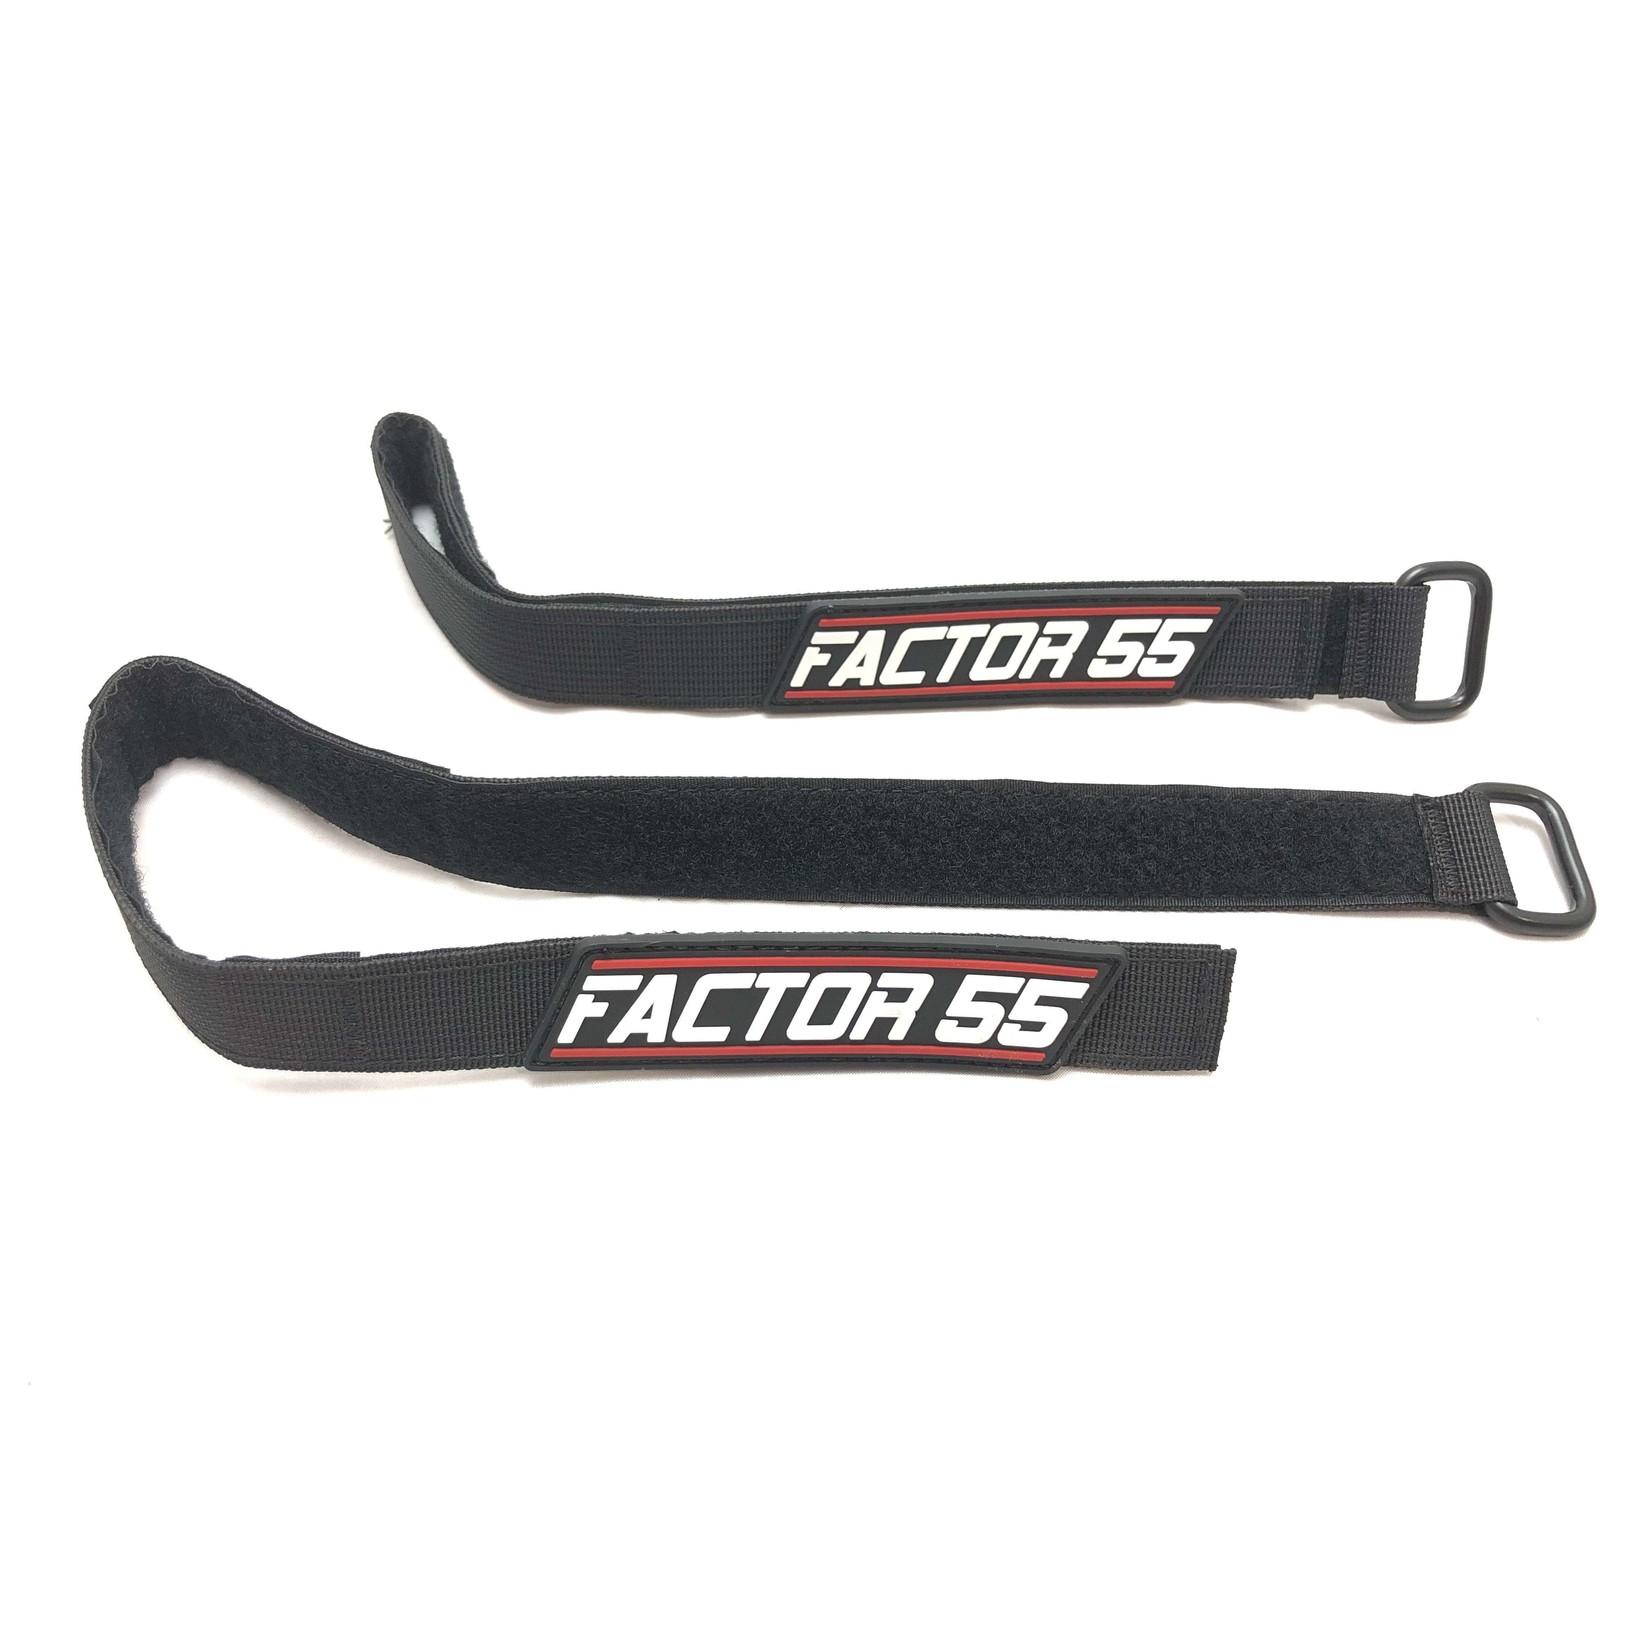 Factor 55 Factor 55 Strap Wraps (Pkg of 2)